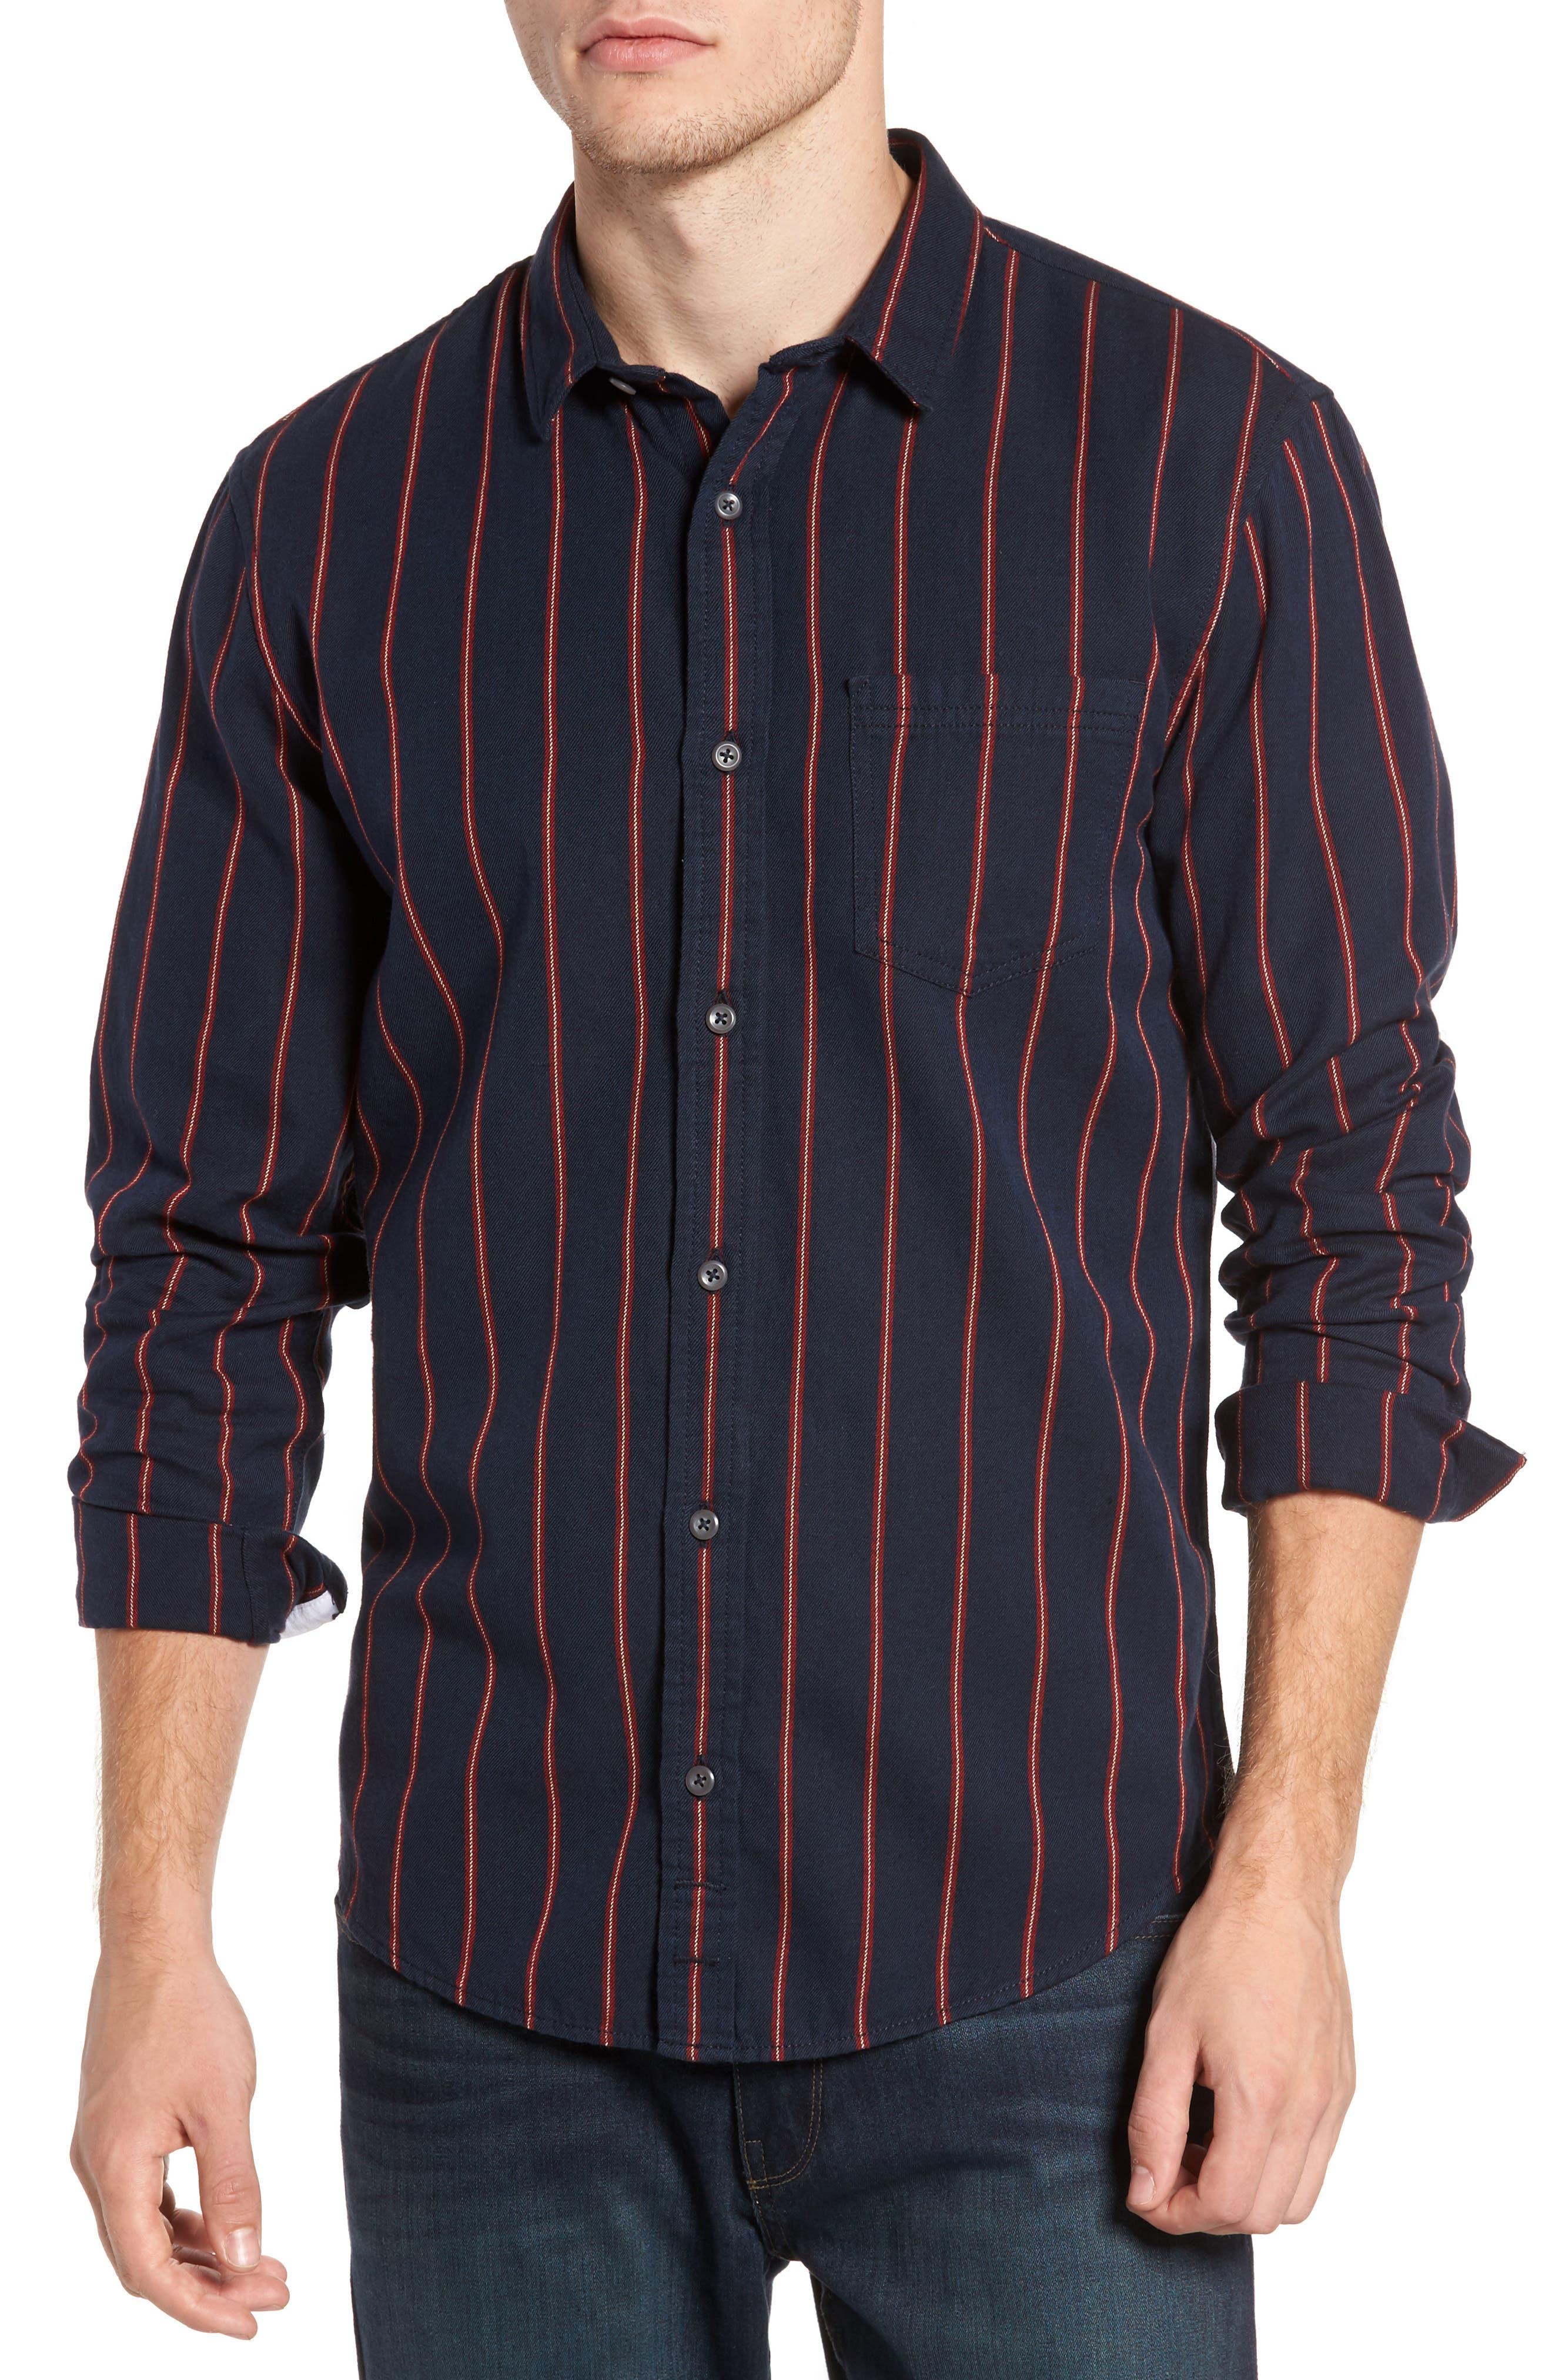 The Rail Long Sleeve Twill Shirt,                             Main thumbnail 1, color,                             Navy Peacoat Red Stripe